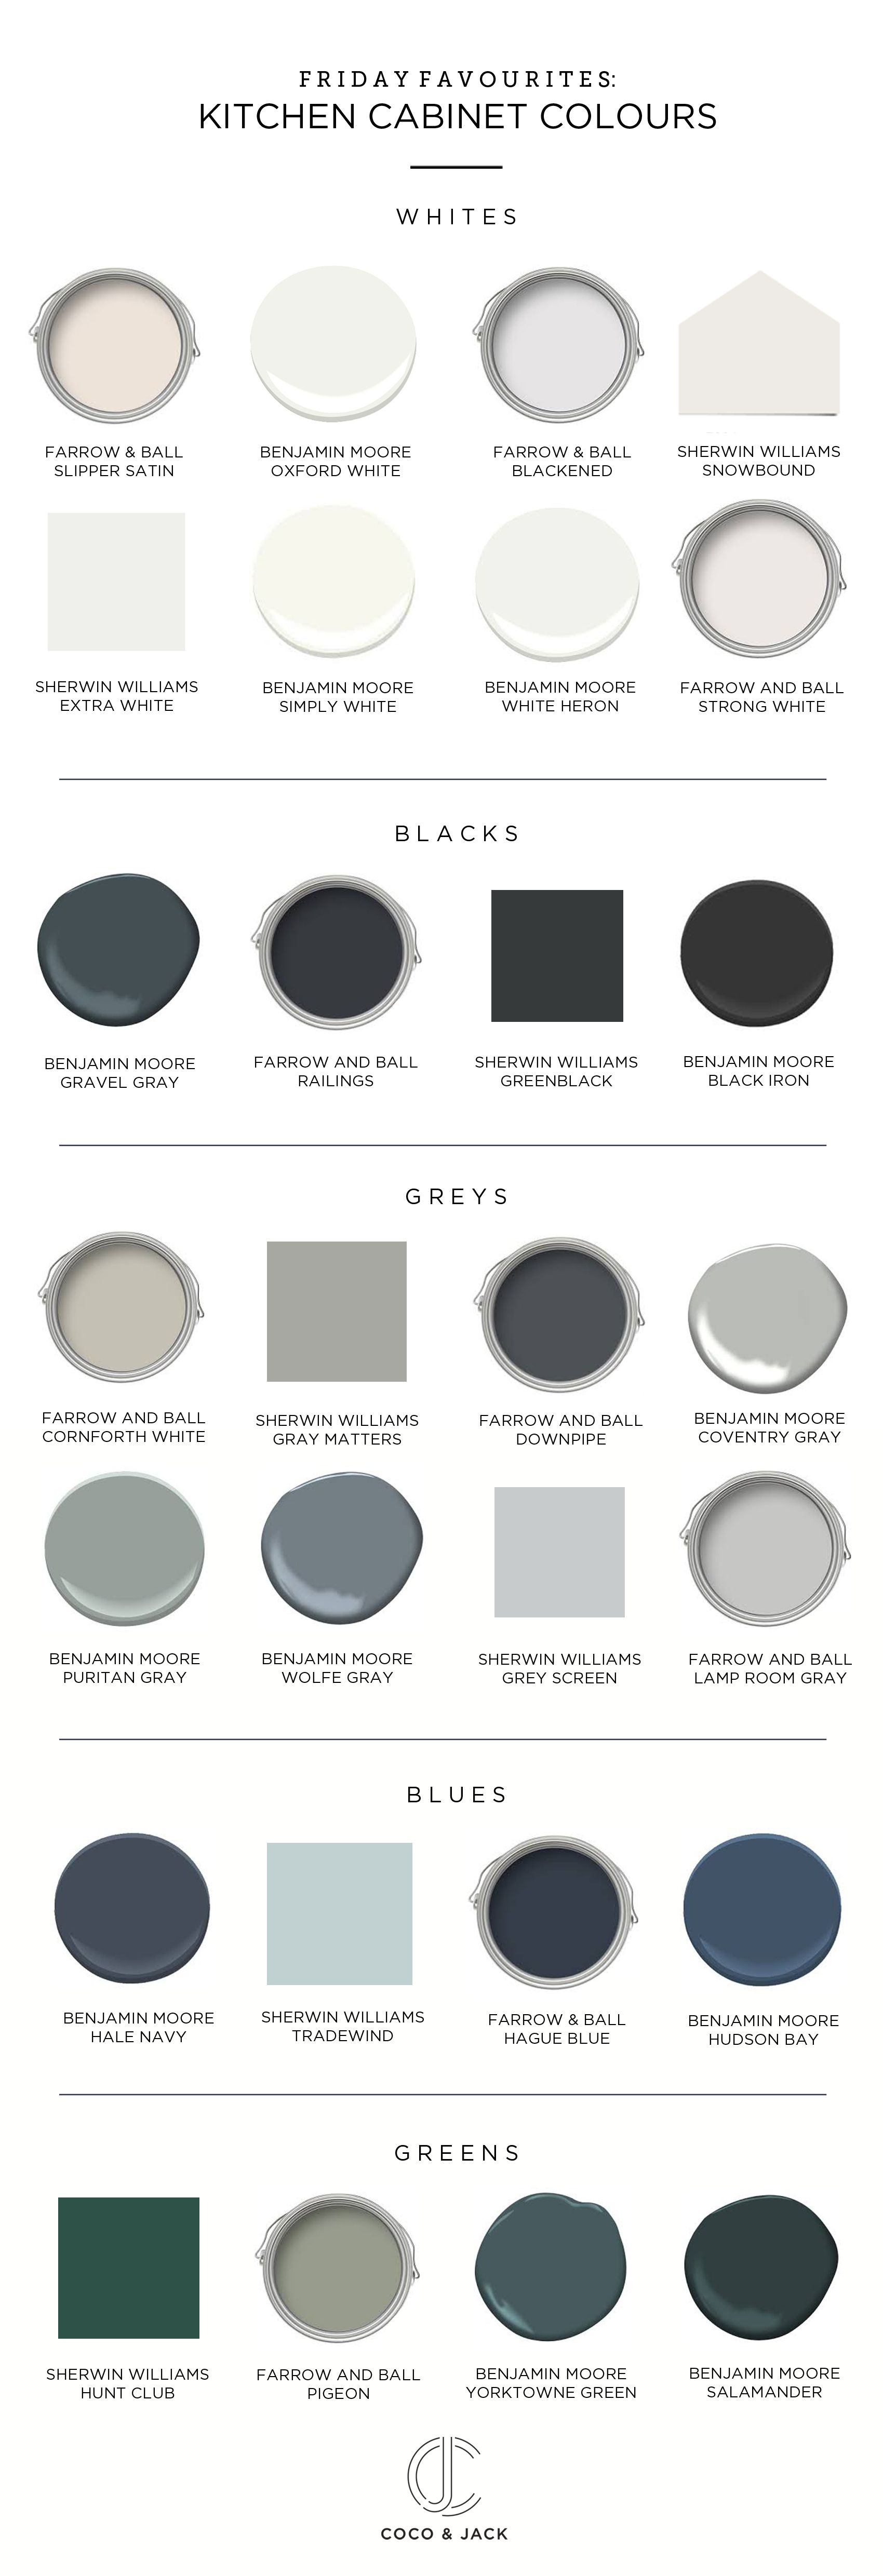 Friday Favourites: Kitchen Cabinet Colours | Coco & Jack | Paint ...